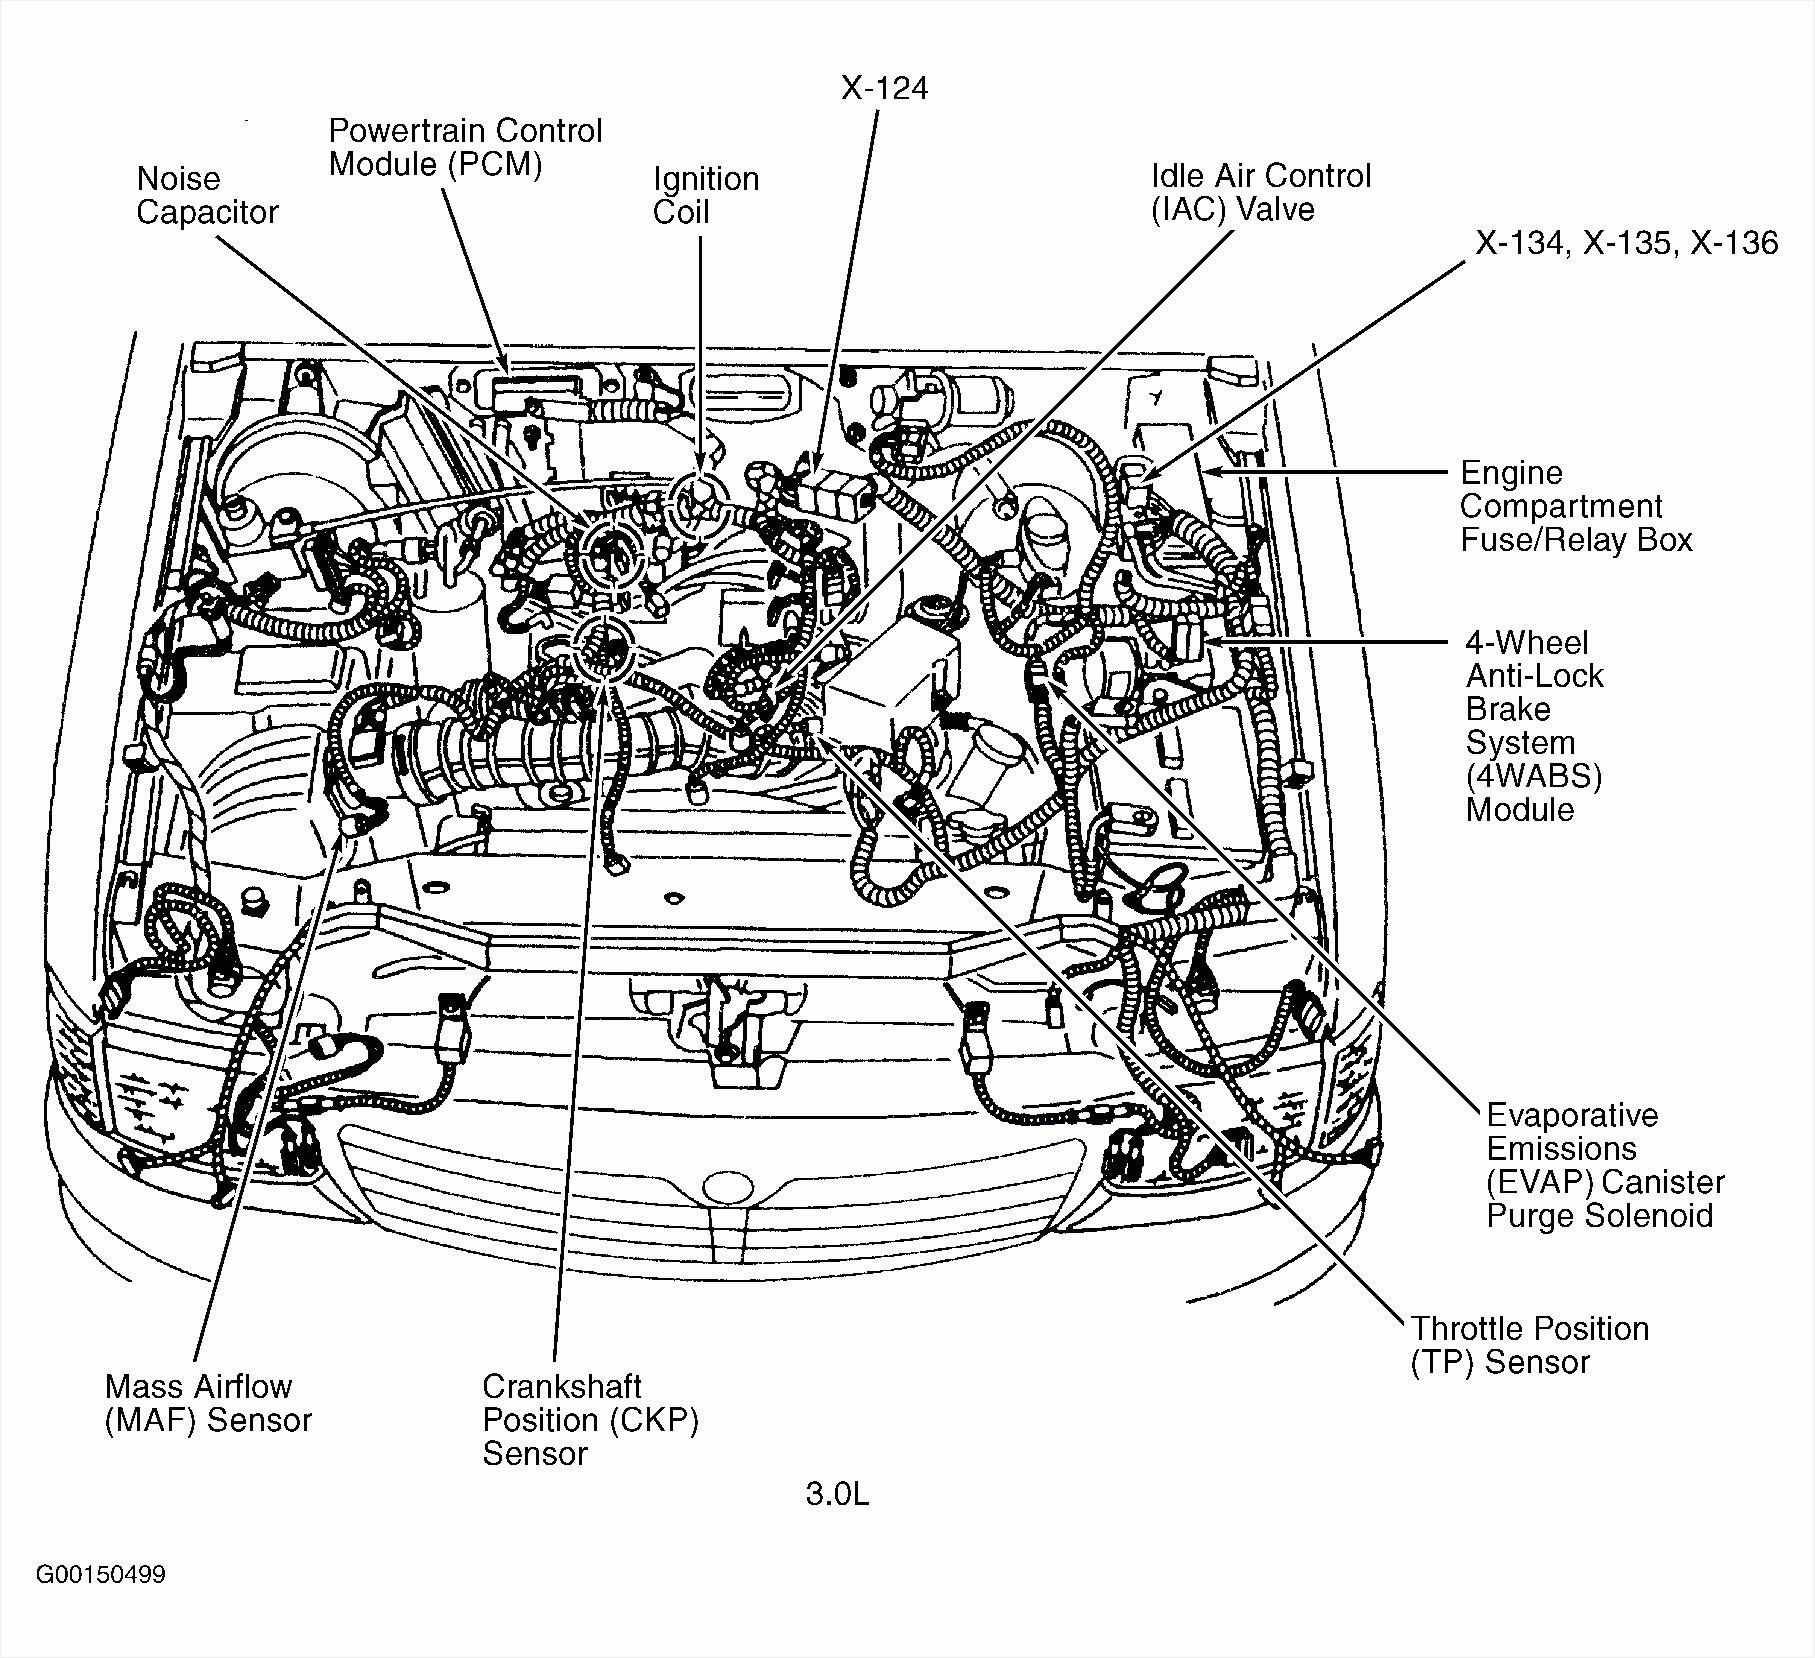 Braking System Diagram 96 Ta A Engine Parts Diagram Wiring Diagram Datasource Of Braking System Diagram